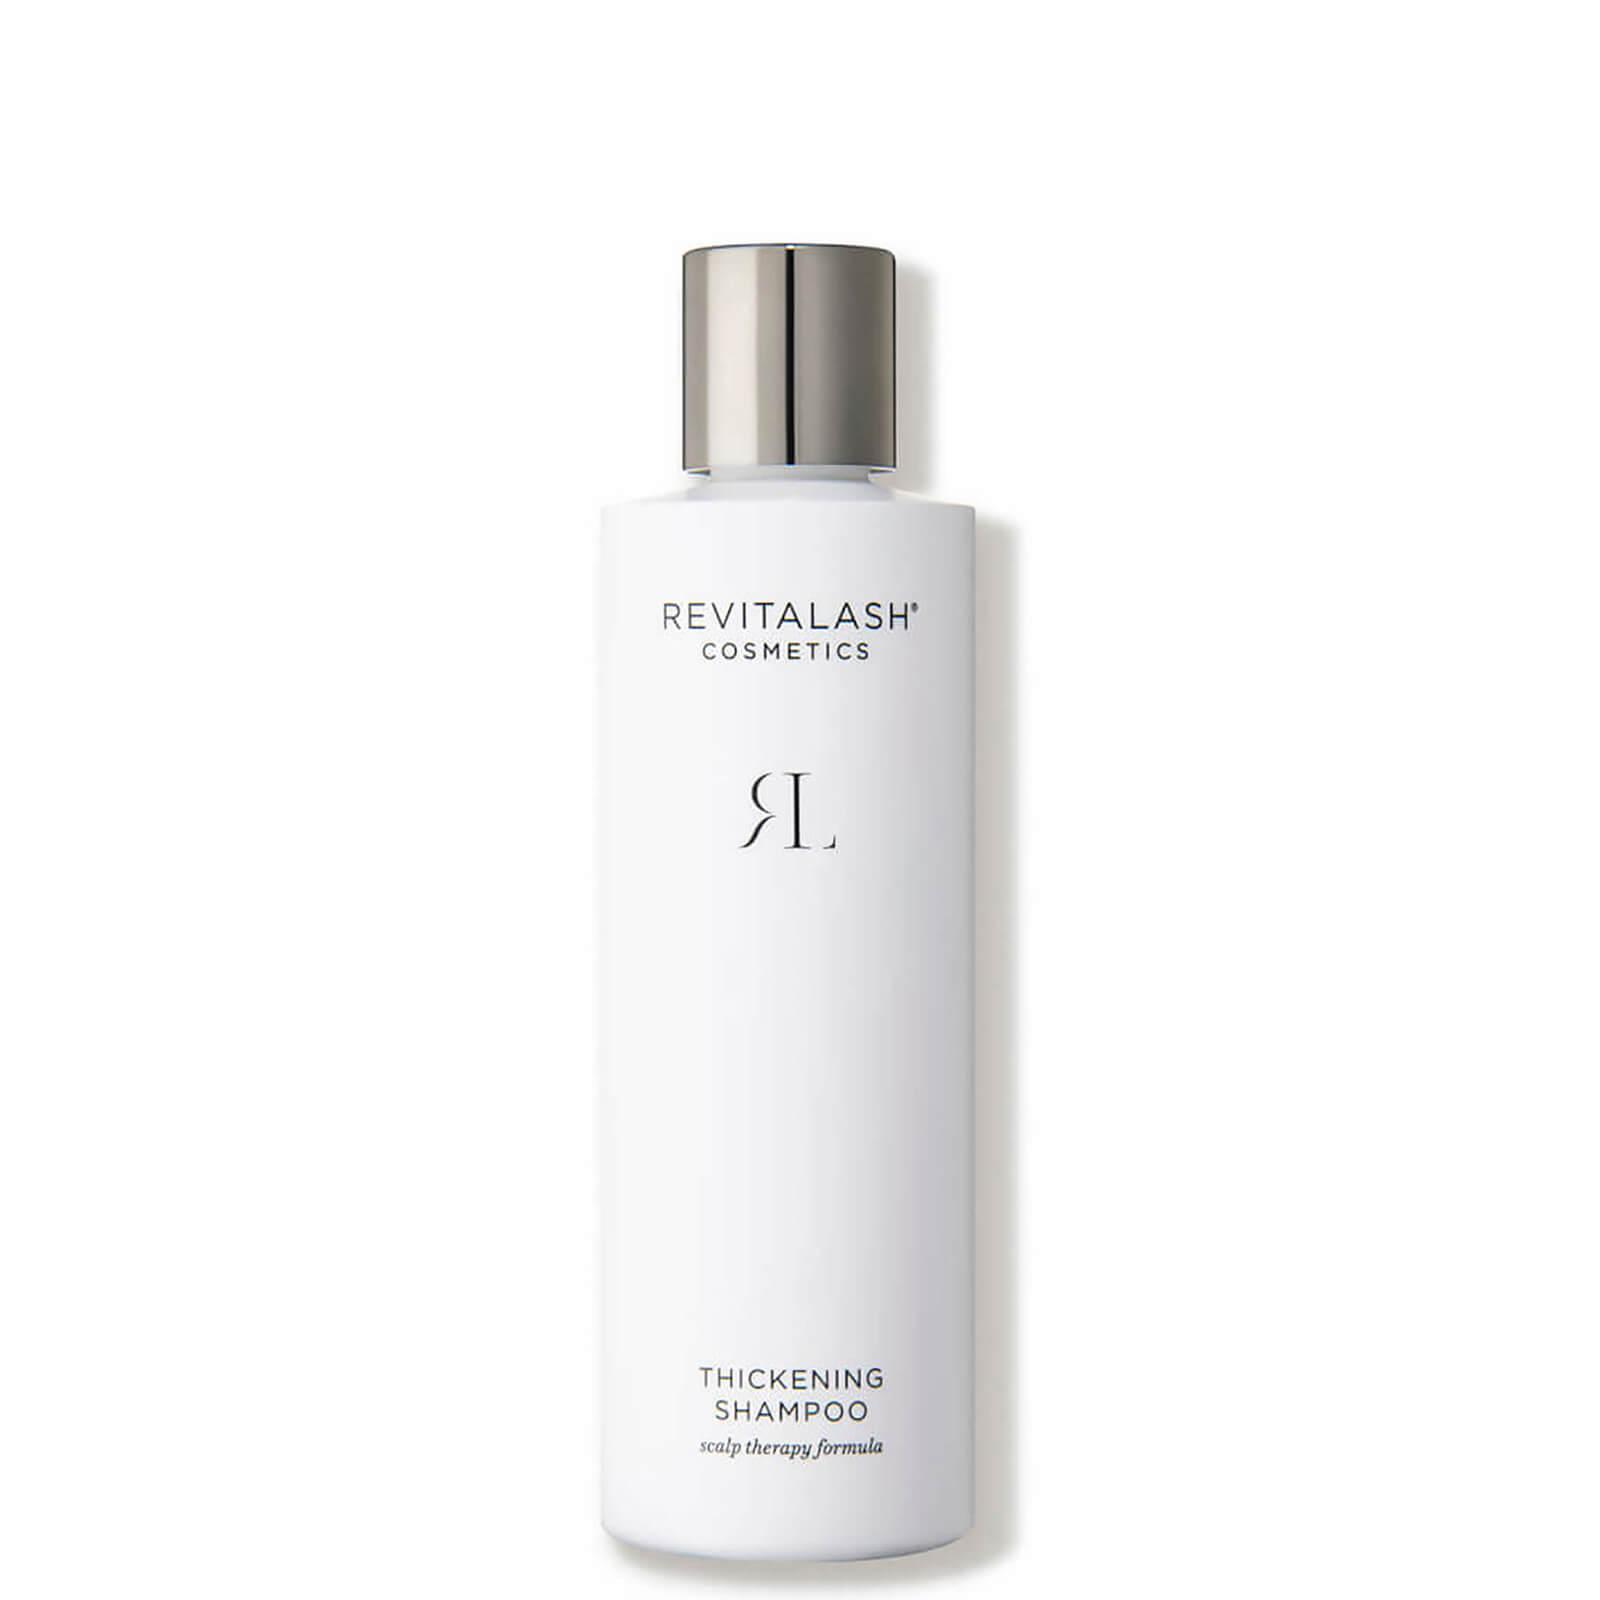 RevitaLash Cosmetics Thickening Shampoo 8.5 fl. oz.